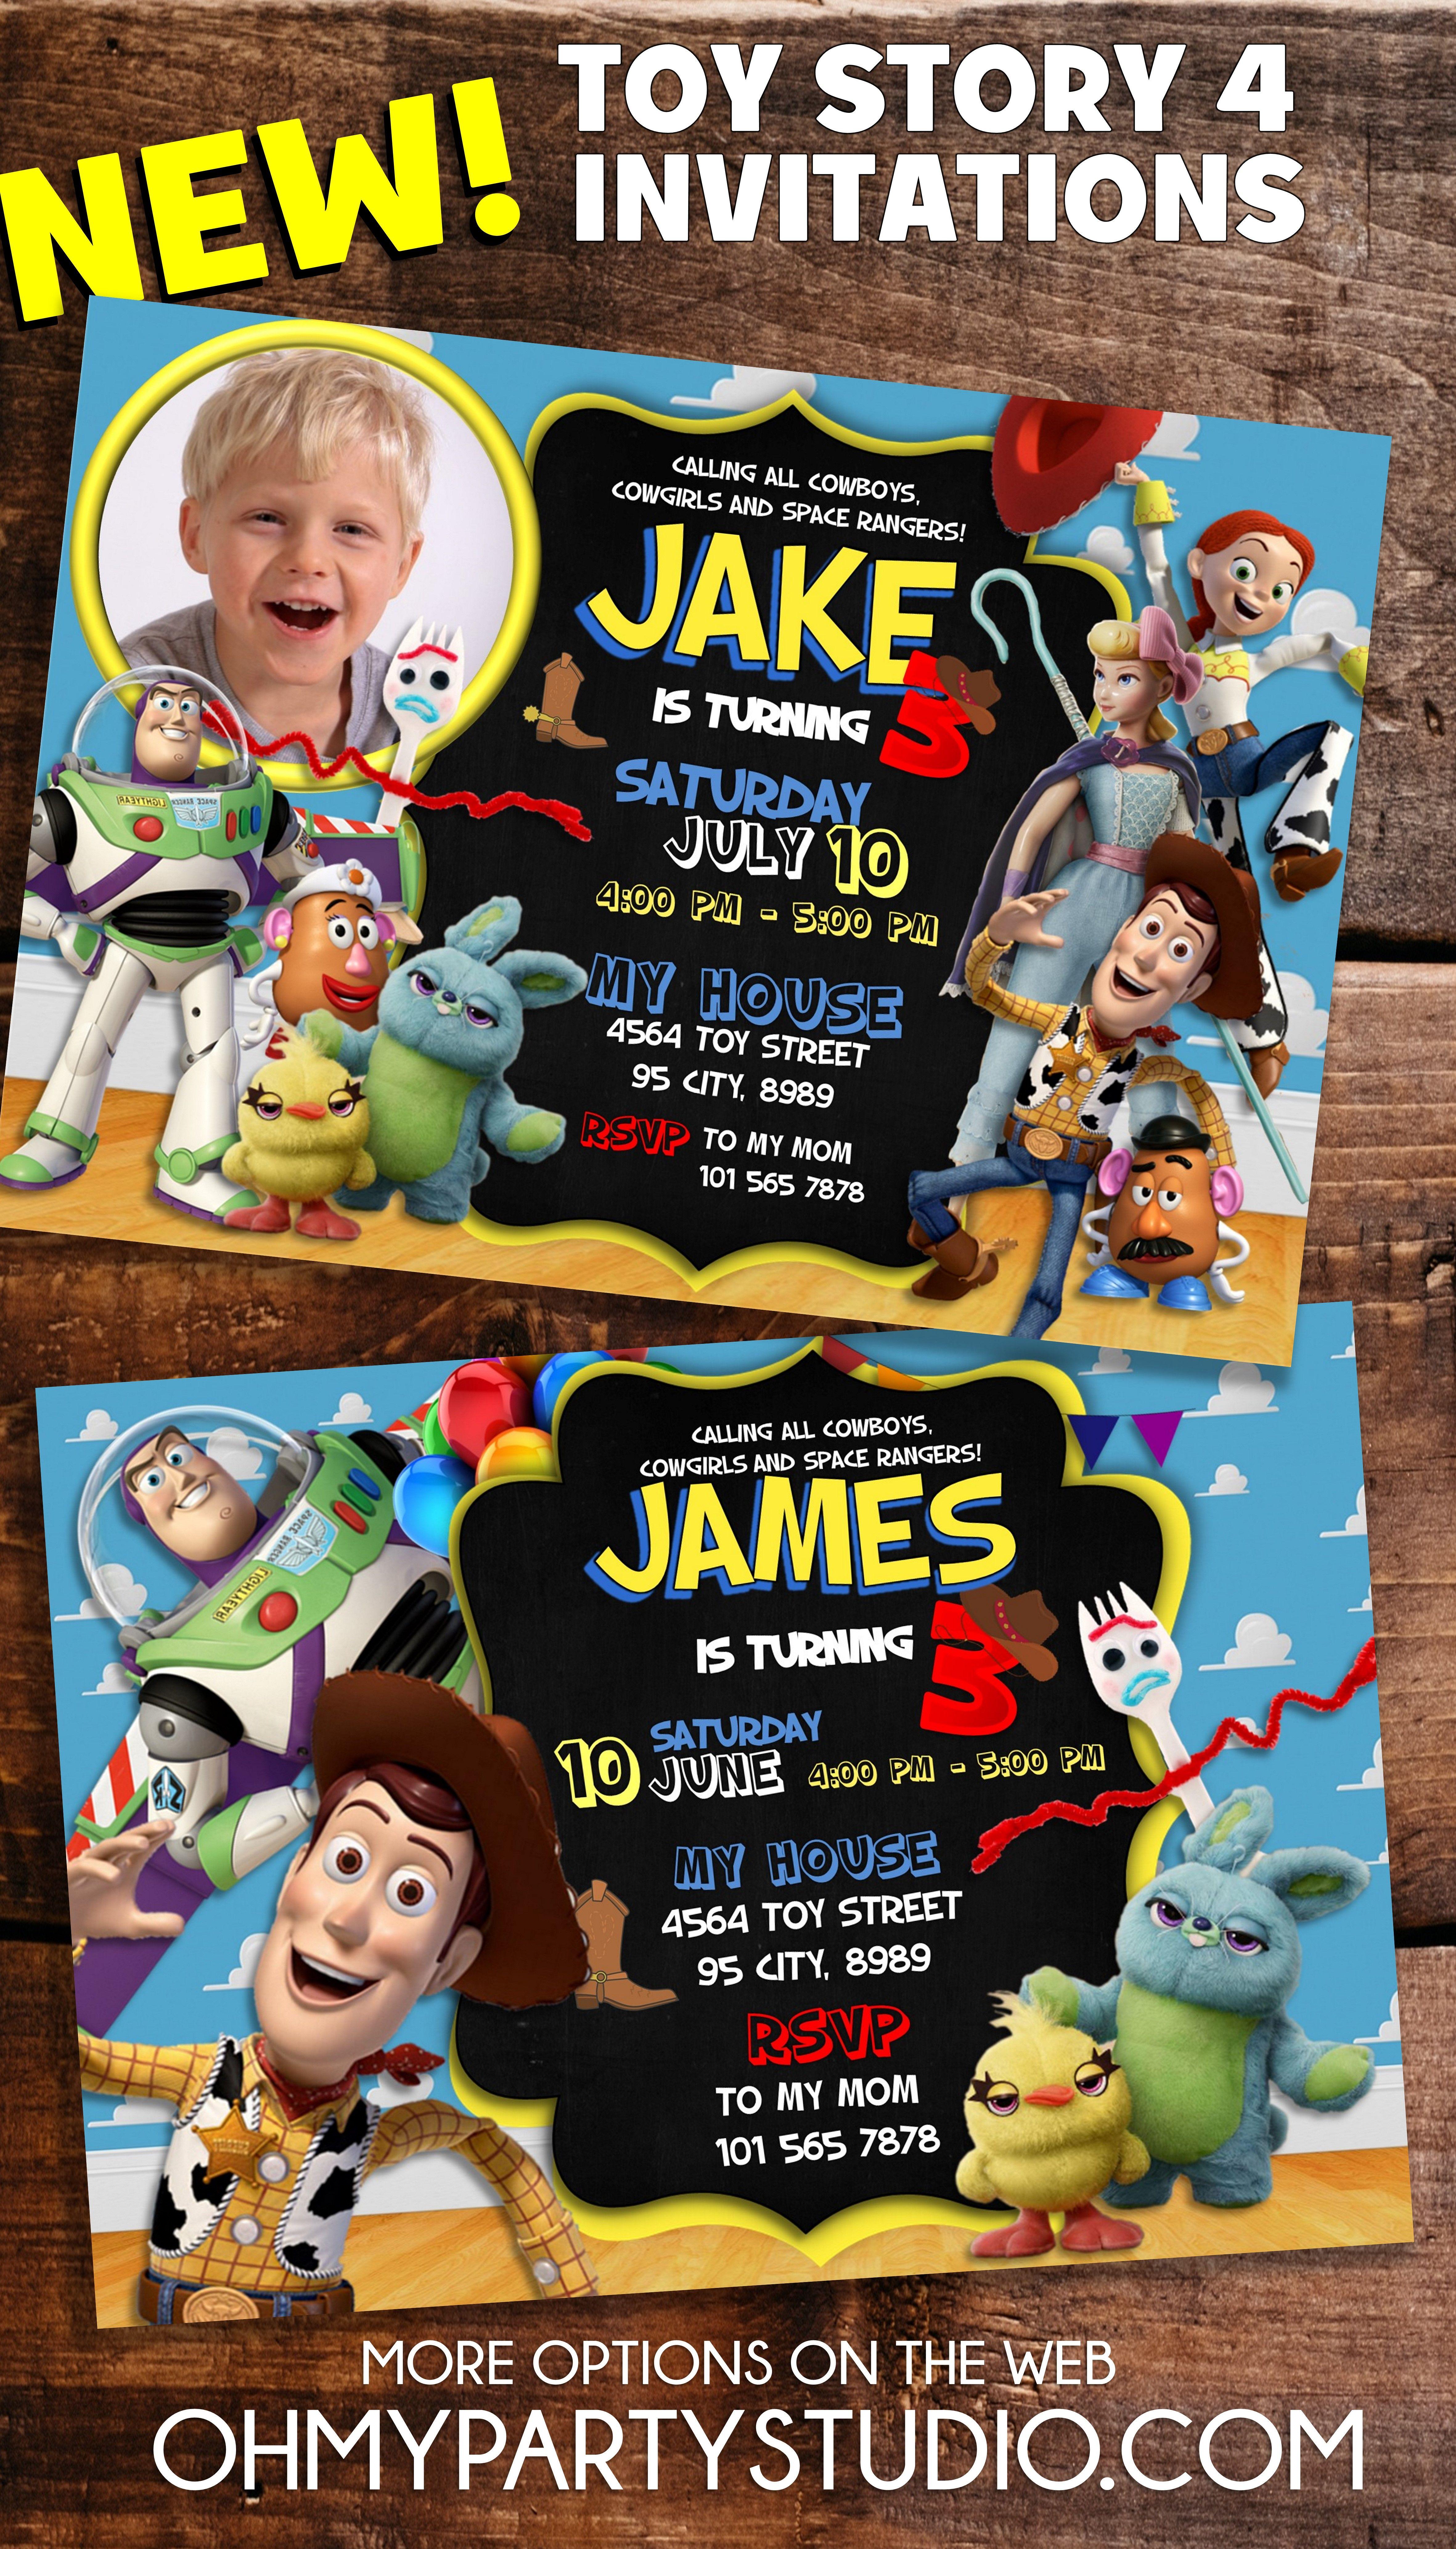 Toy Story Birthday Party Ideas Toy Story 4 Birthday Party